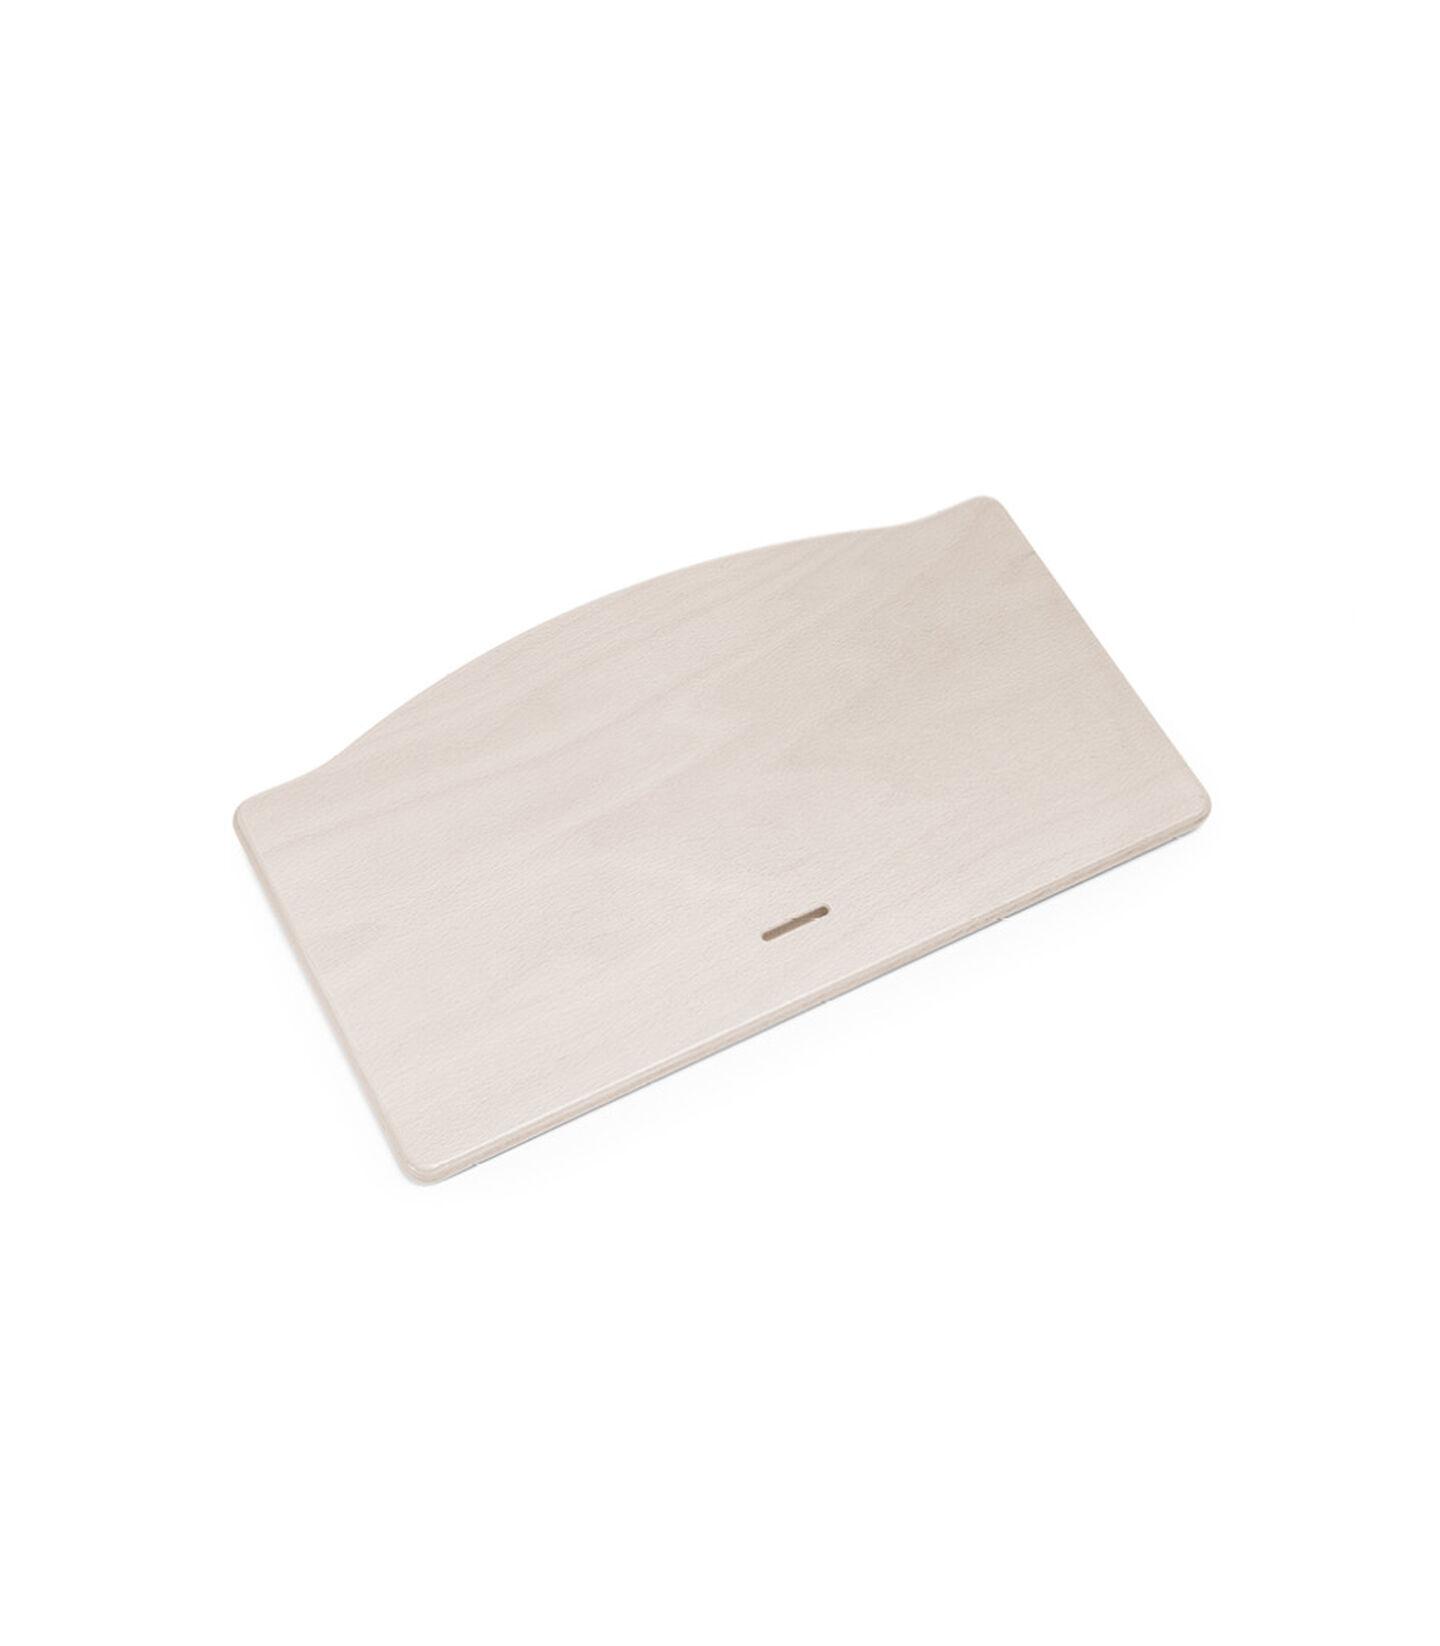 Tripp Trapp® Sitzplatte Whitewash, Whitewash, mainview view 1